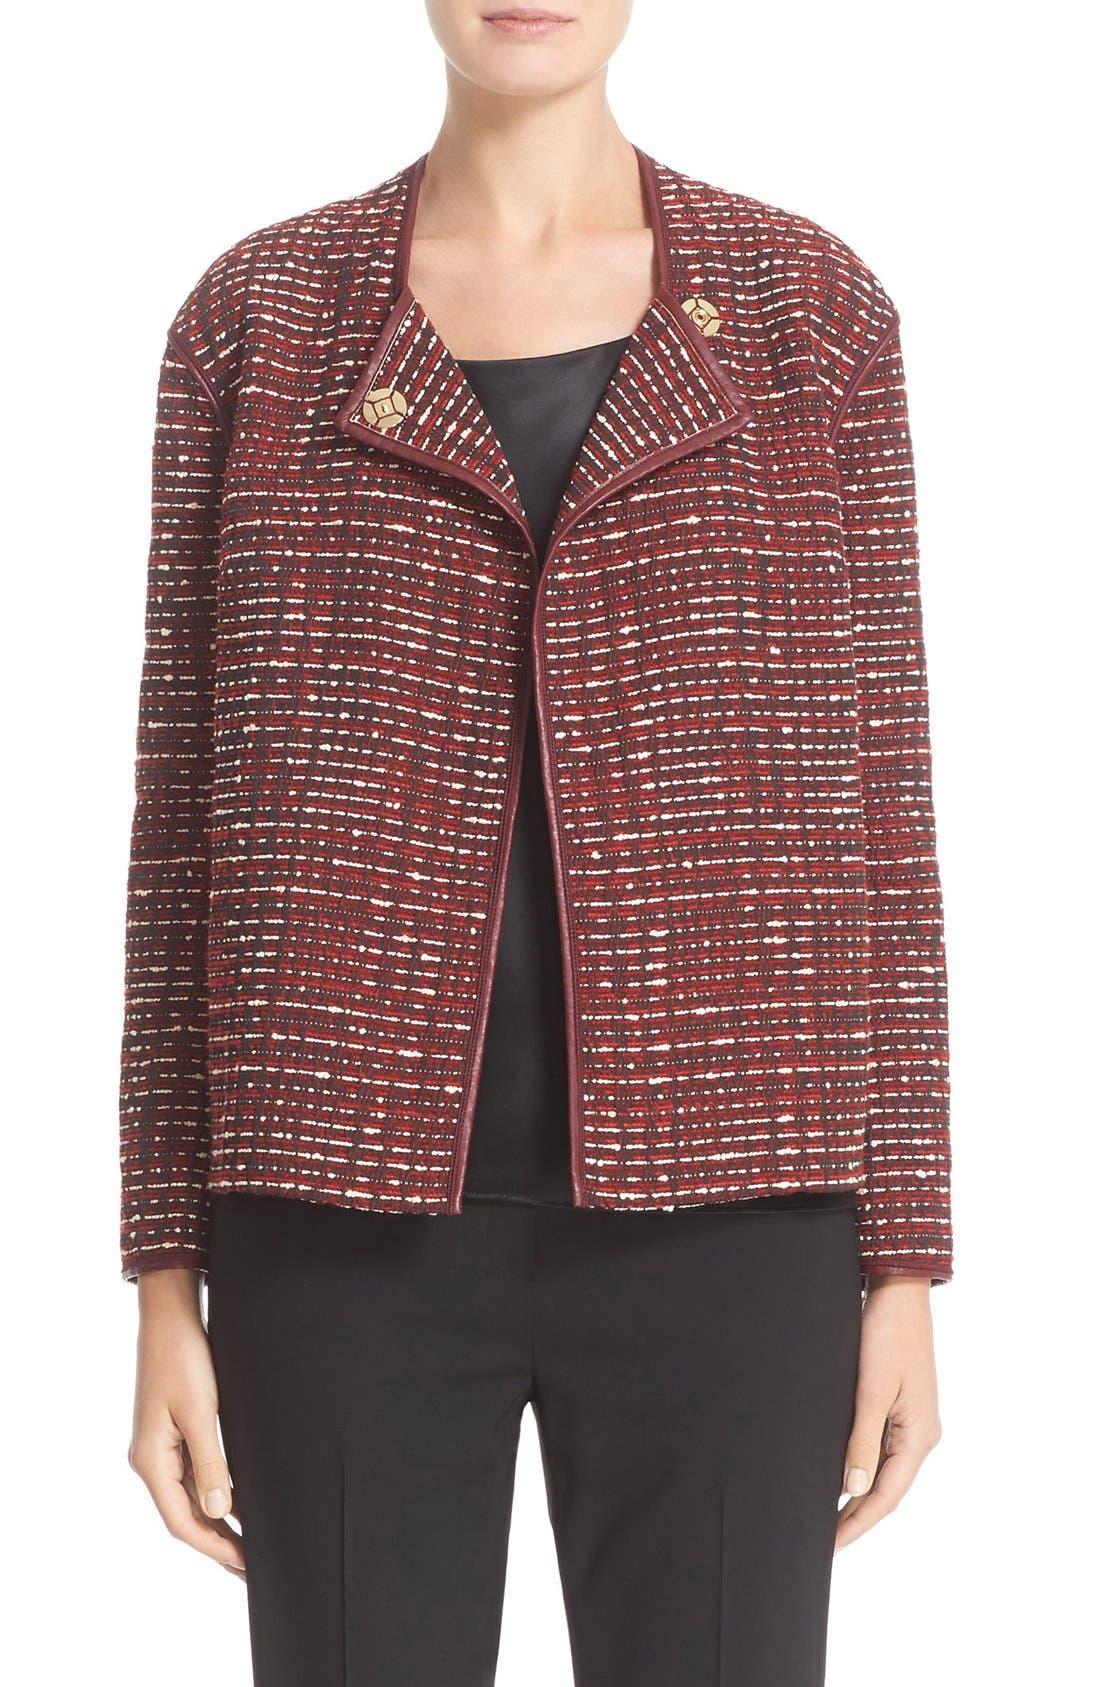 Main Image - Lafayette 148 New York 'Dane' Tweed Jacket